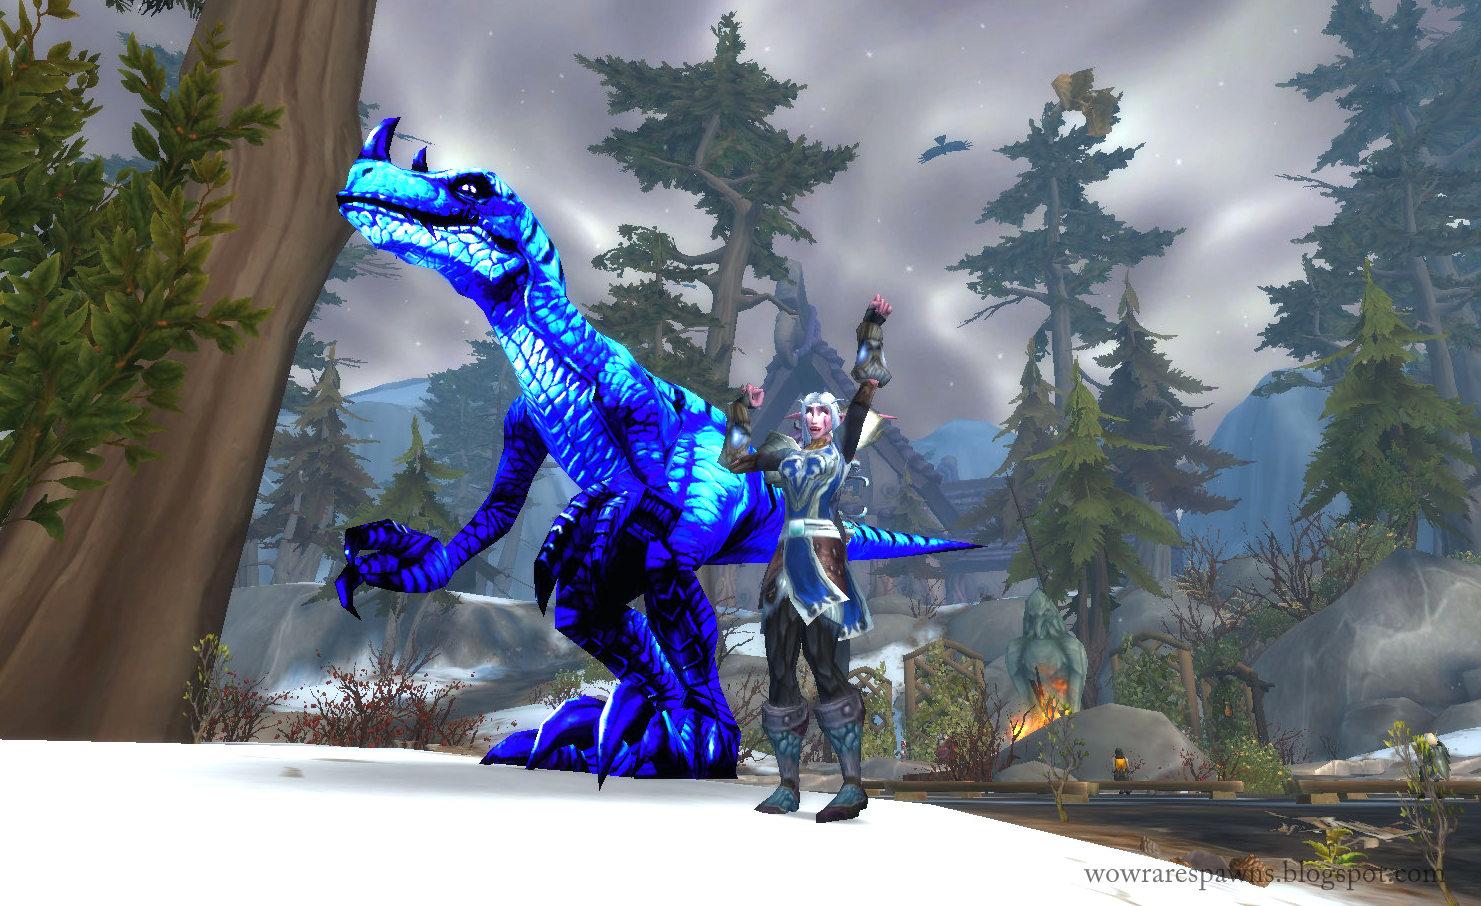 WoW Rare Spawns: Gon - Inky Blue Spirit Raptor